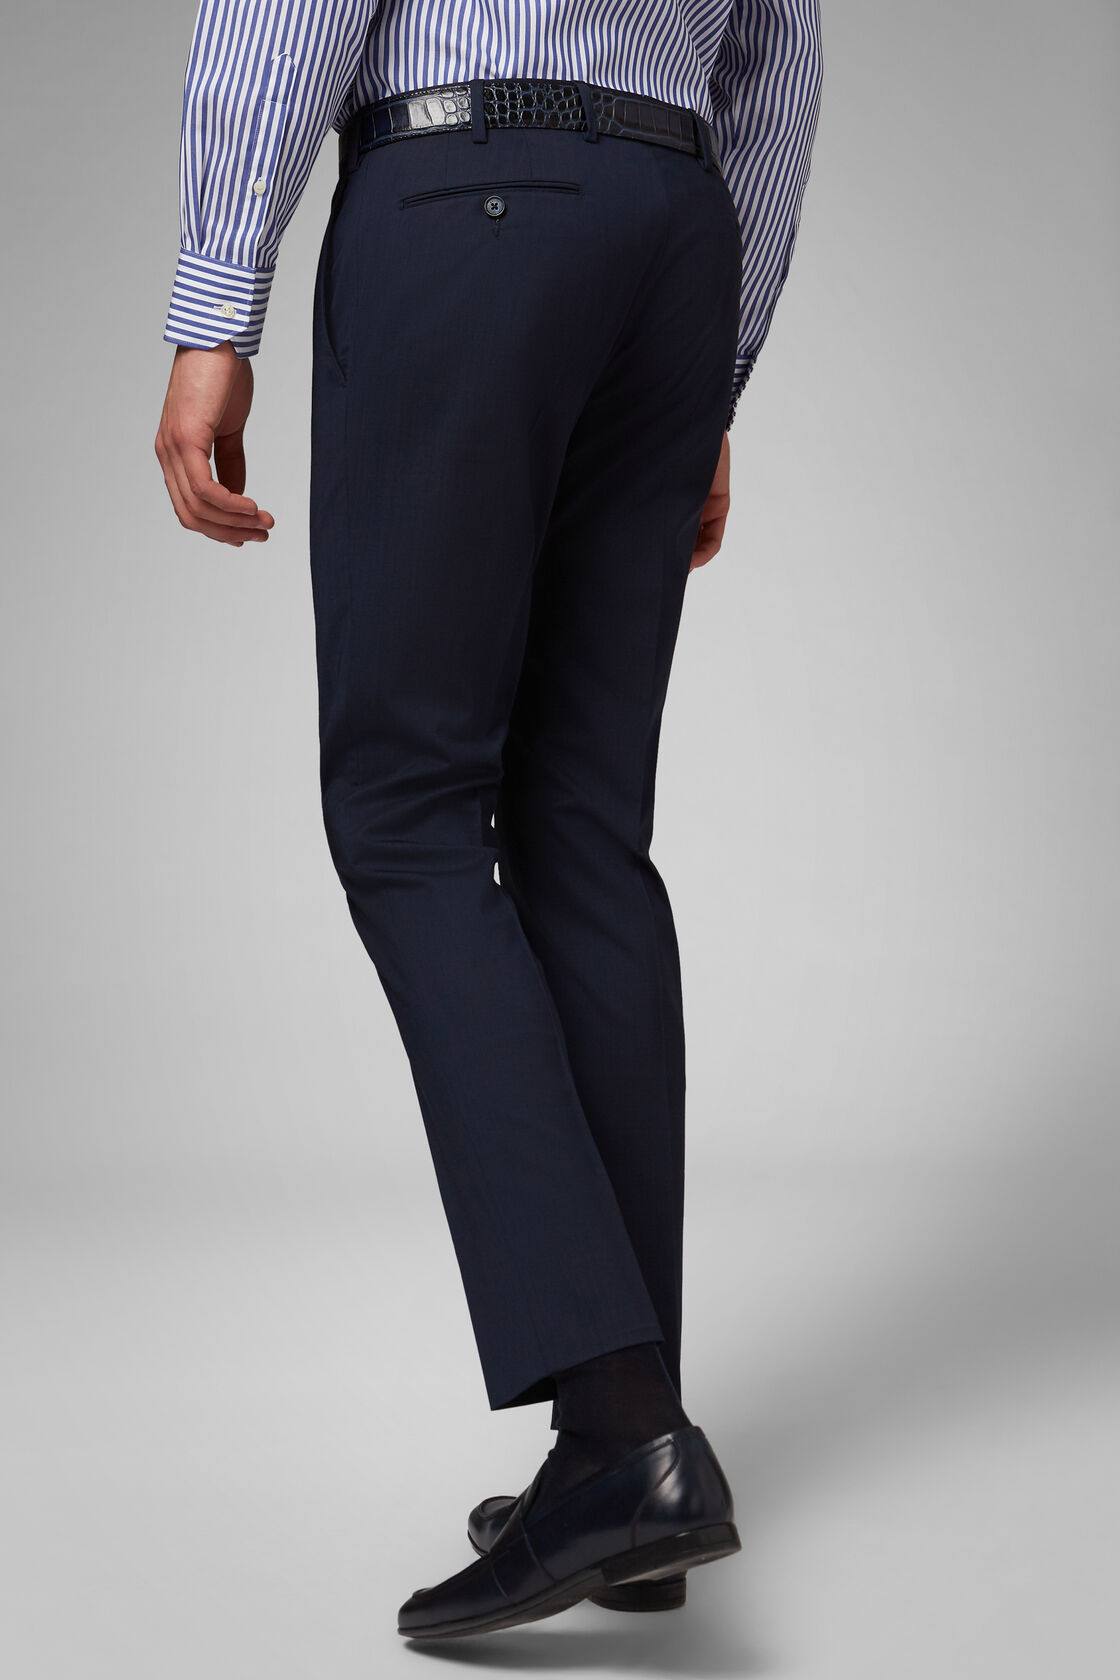 Pantalone In Lana Stretch Slim, , hi-res